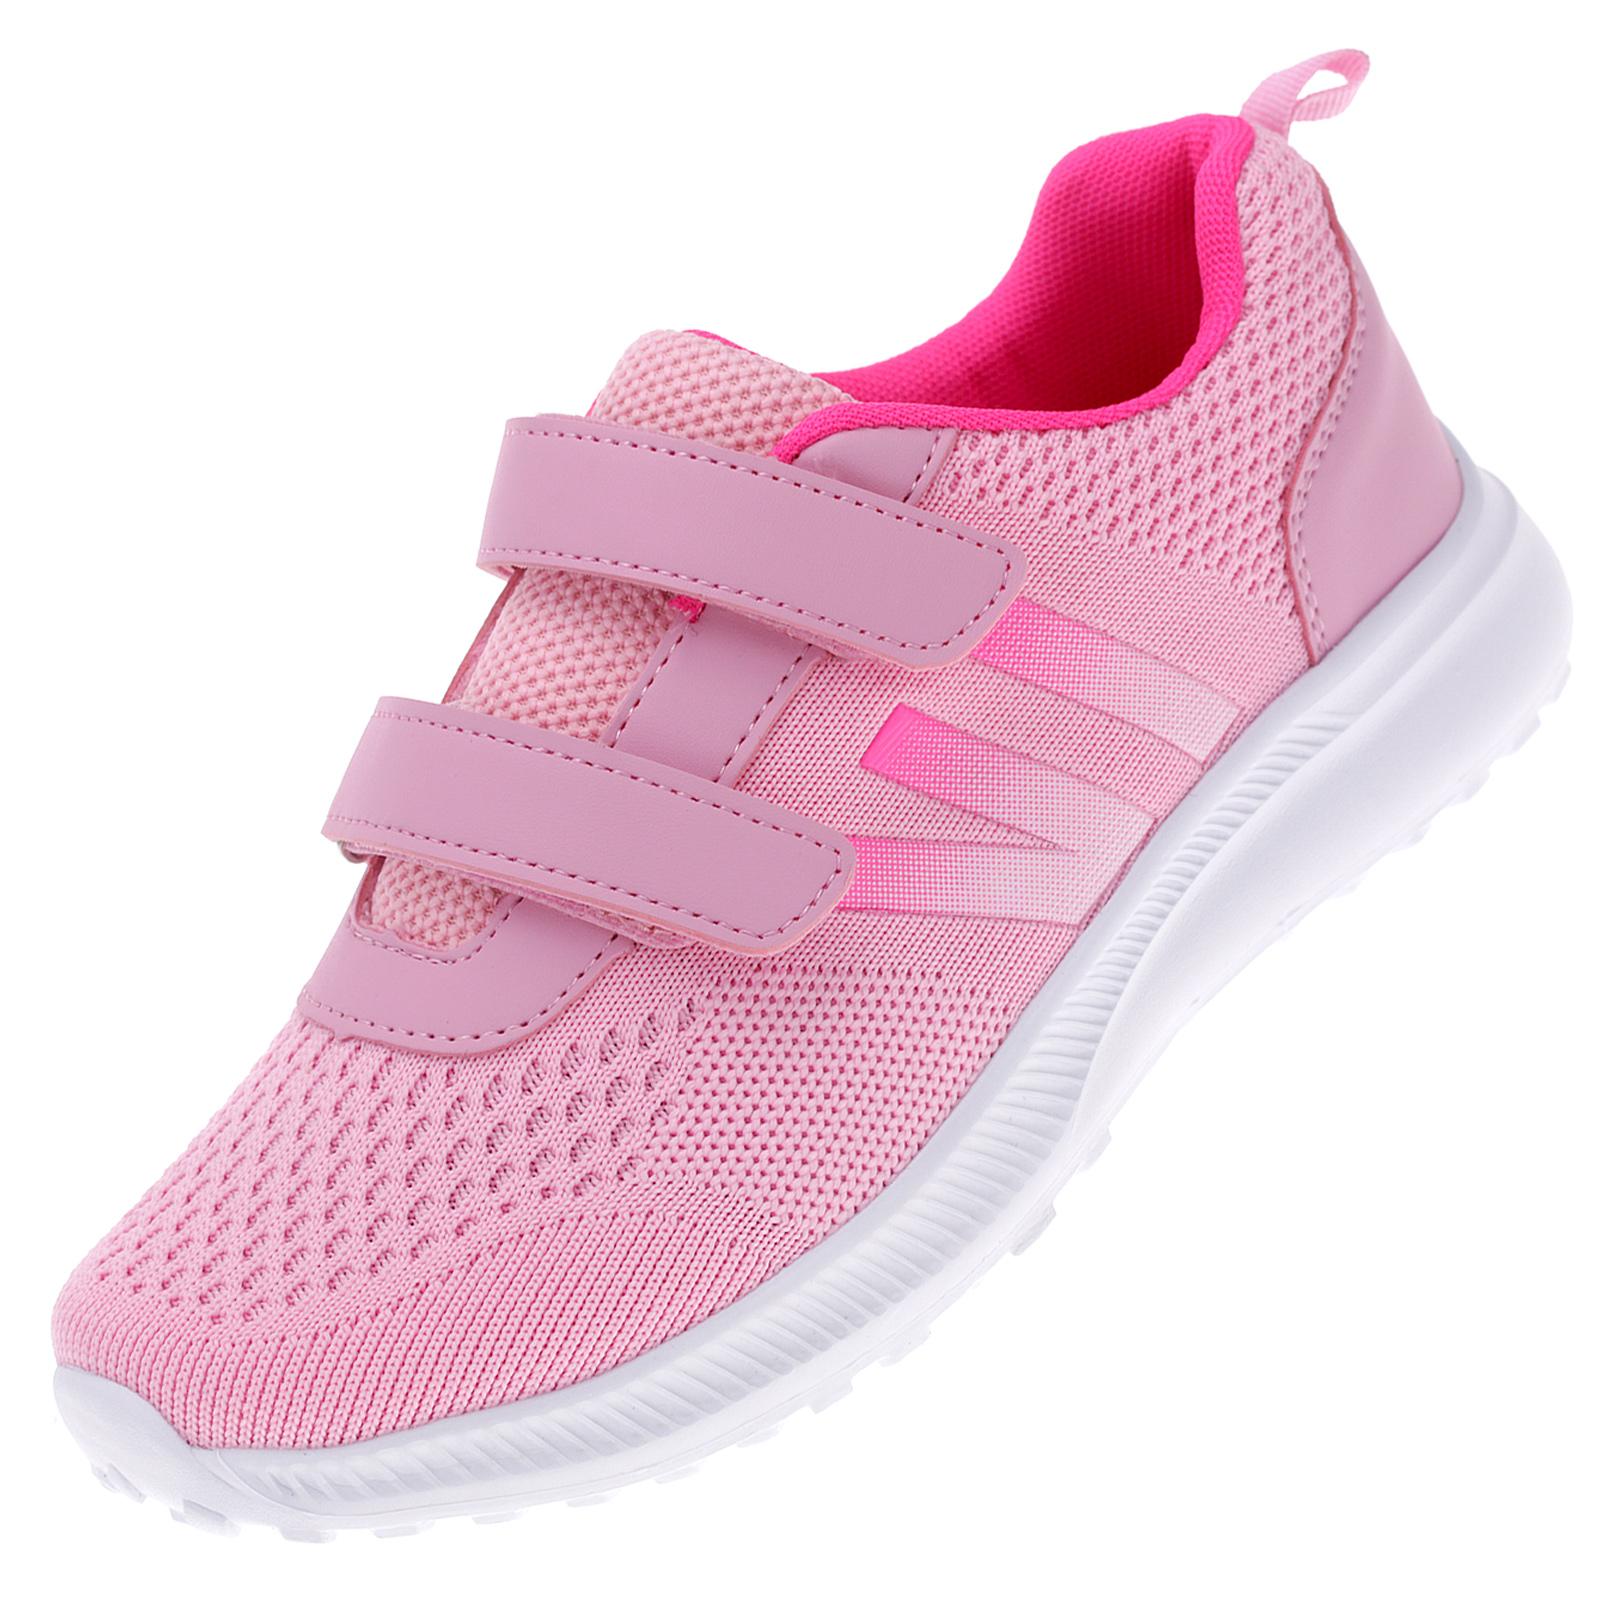 Damen Sportschuhe Sneaker Turnschuhe Freizeitschuhe 37-42 Klettverschluss W-CH028